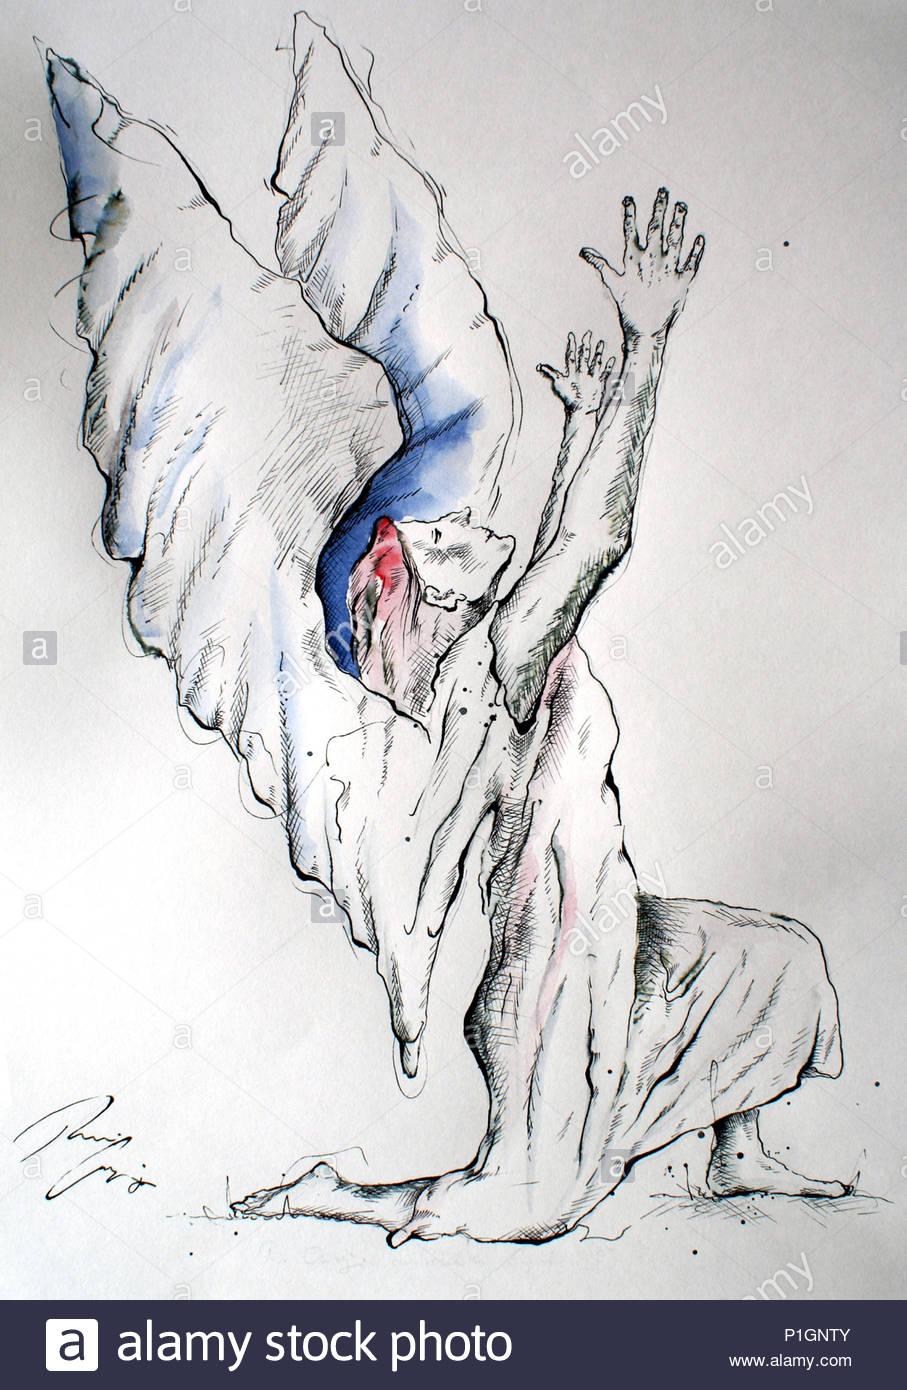 angel worshiping 2 - Stock Image